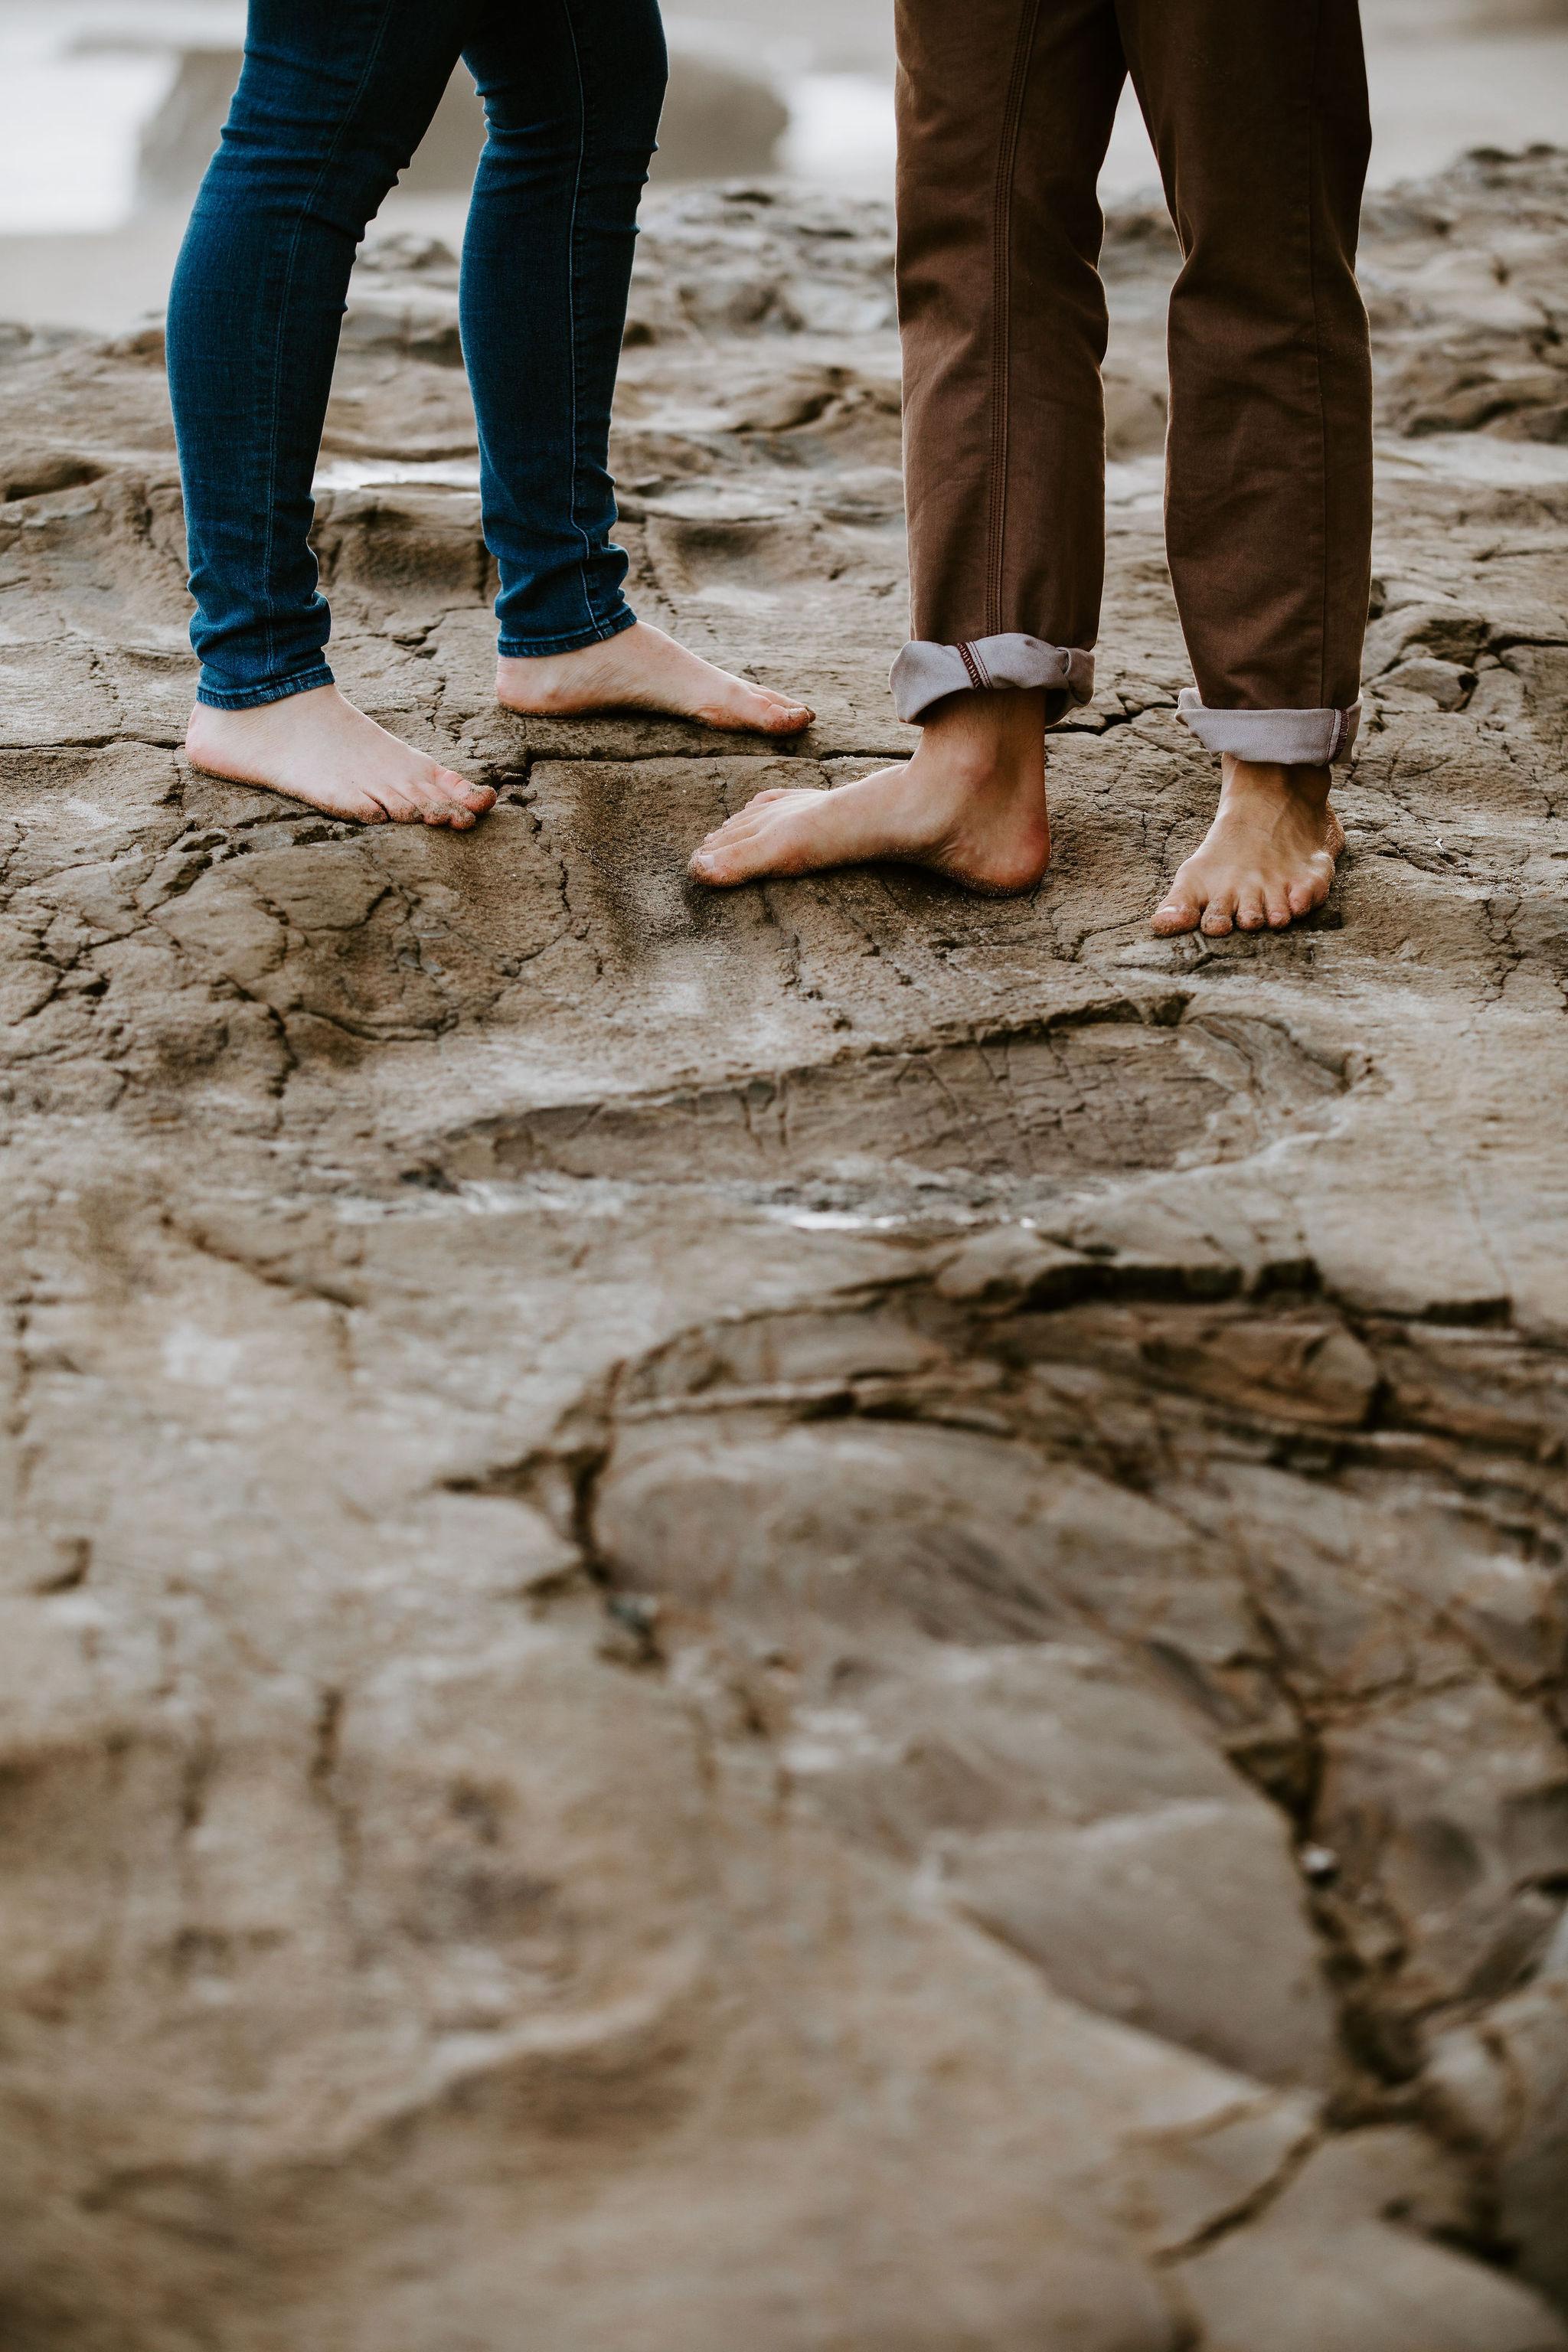 LittleDumeEngagementSession_Geoff&LyndsiPhotography_Savannah&Jordan29.jpg